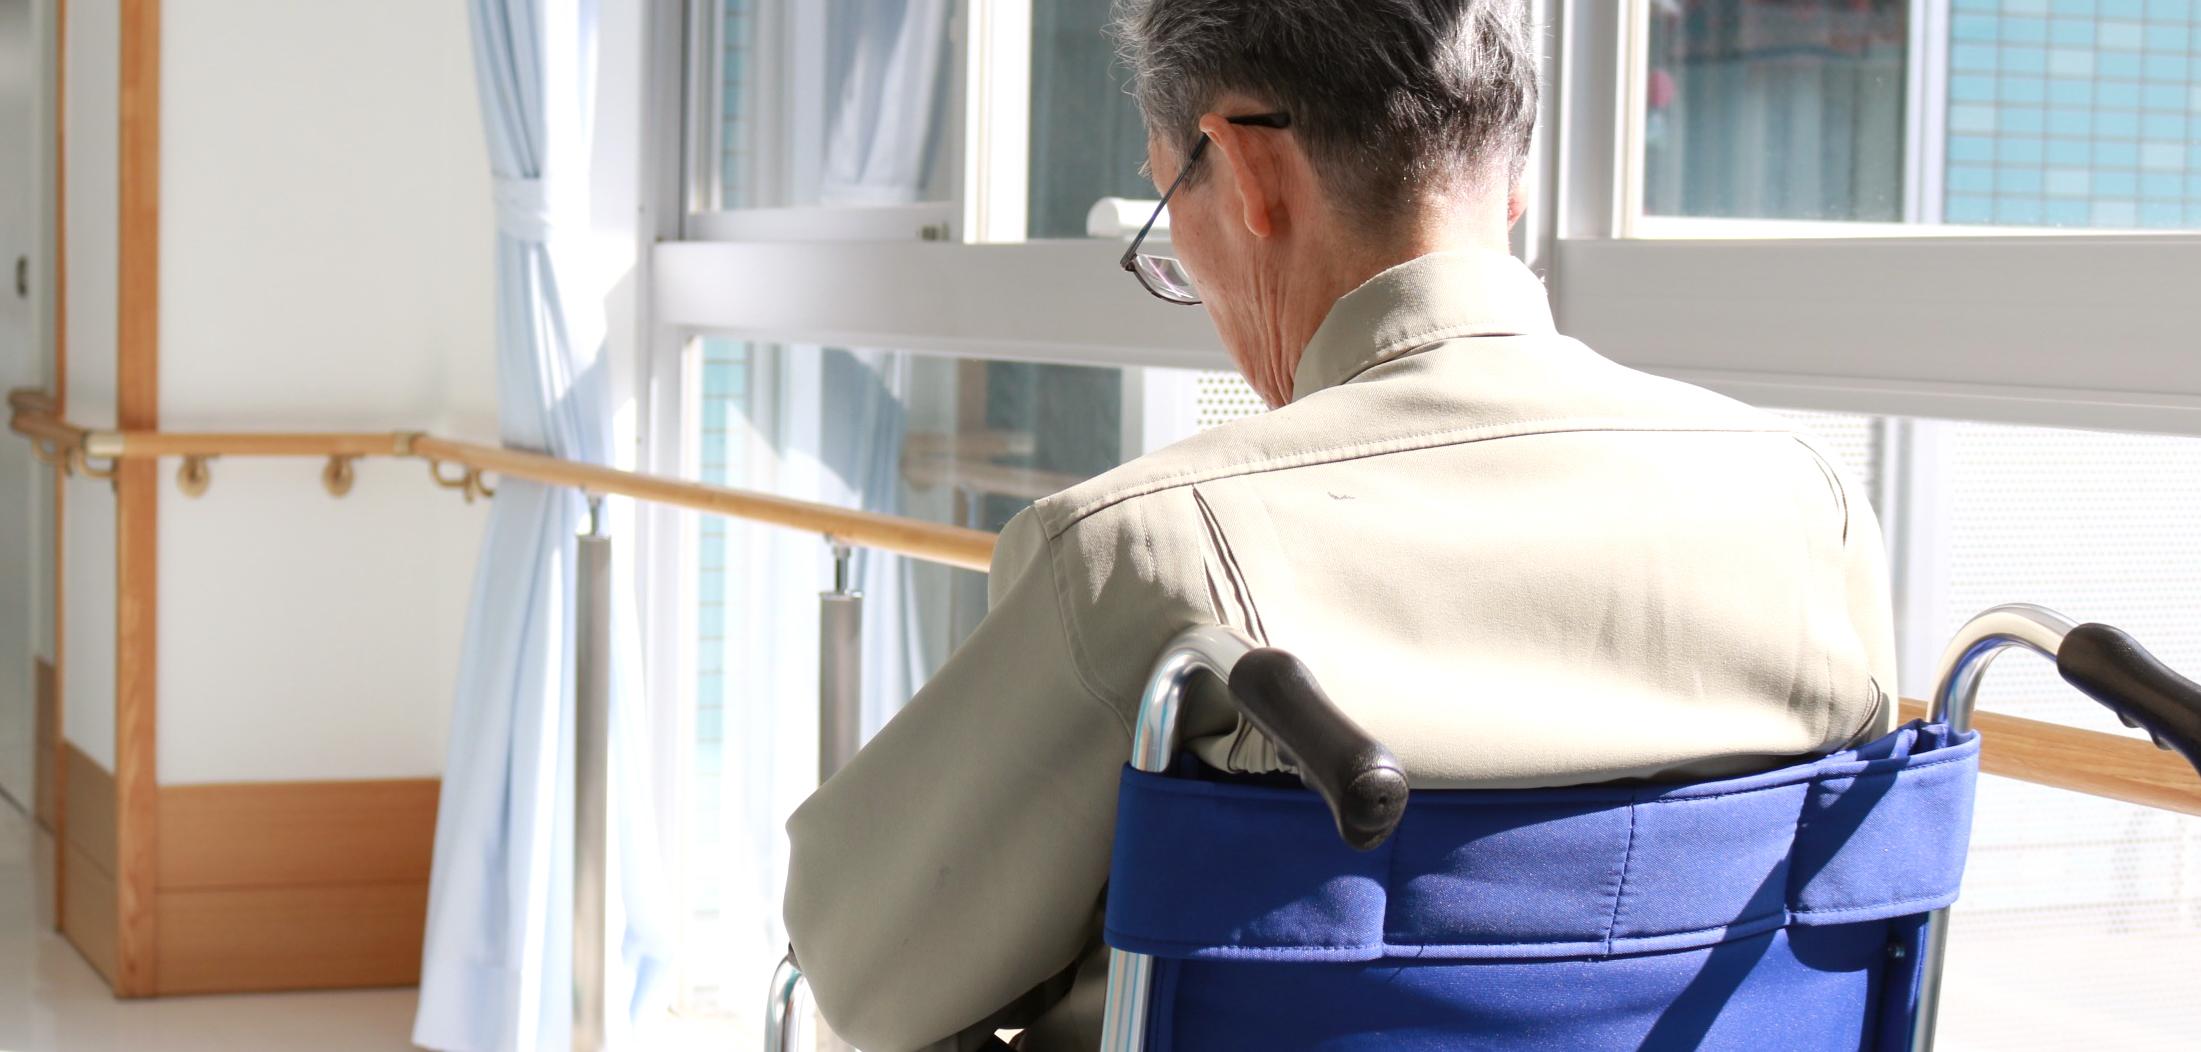 東京都認知症疾患医療センター